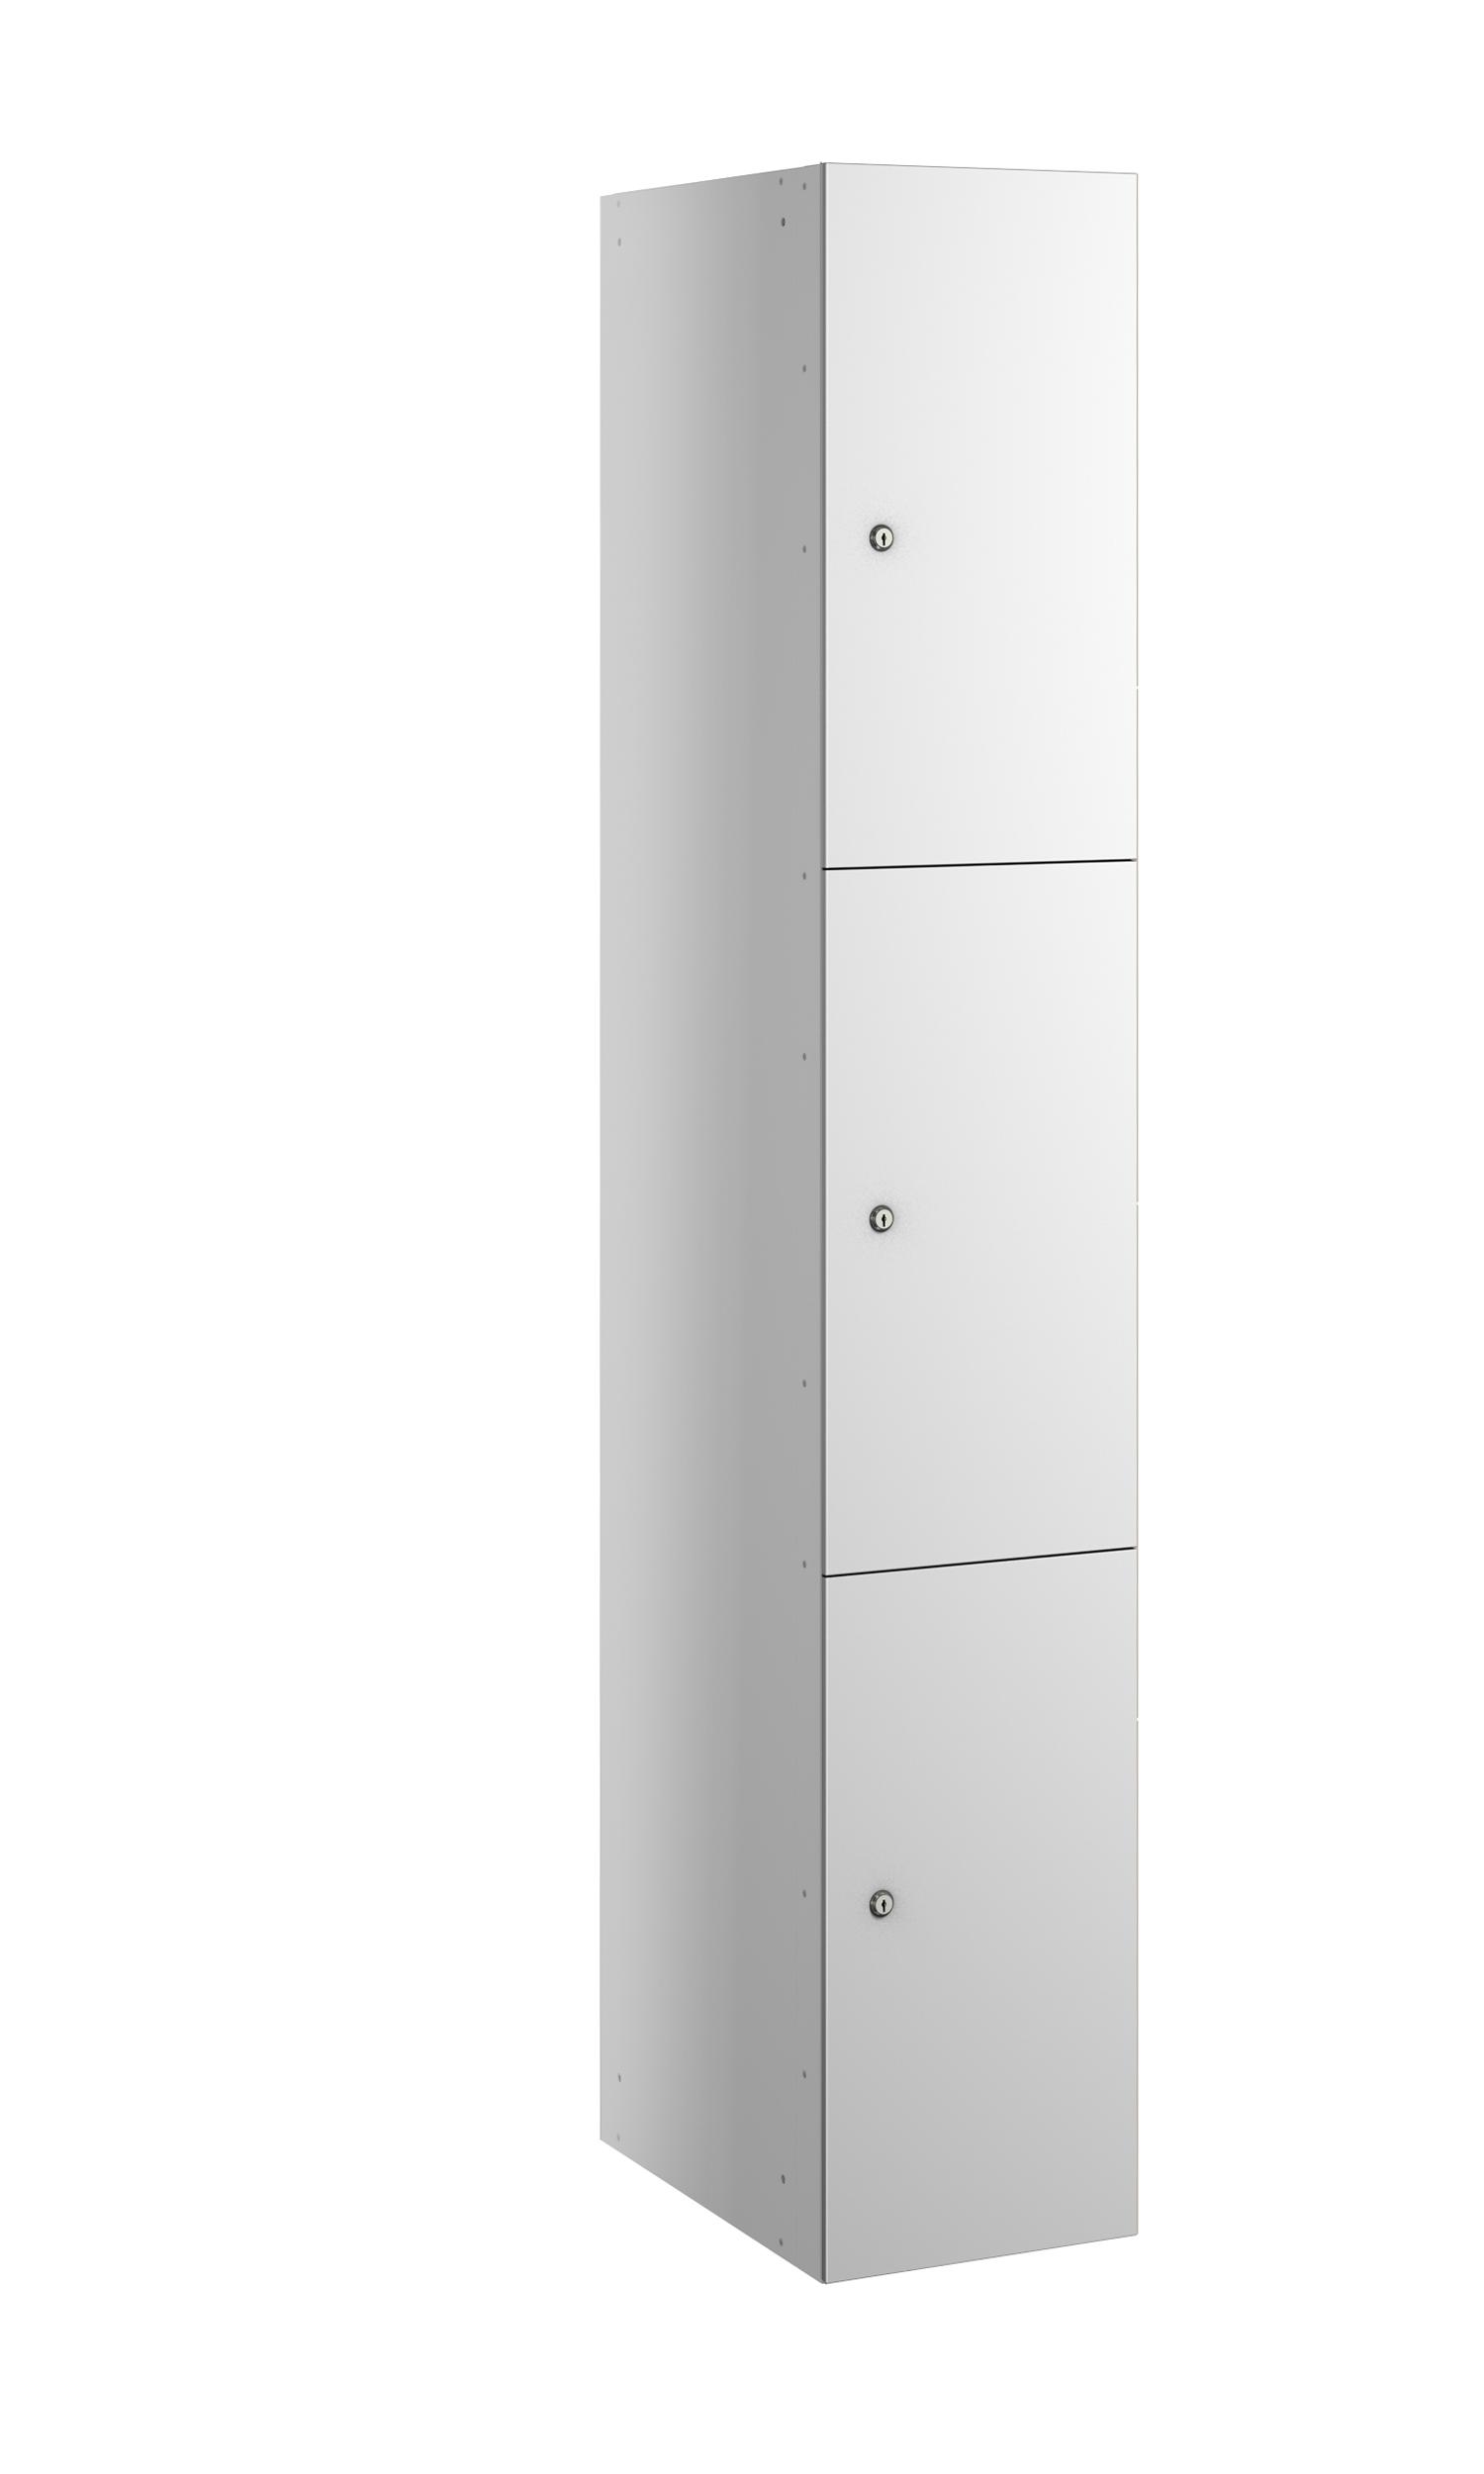 Probe buzzbox laminate 3 doors white